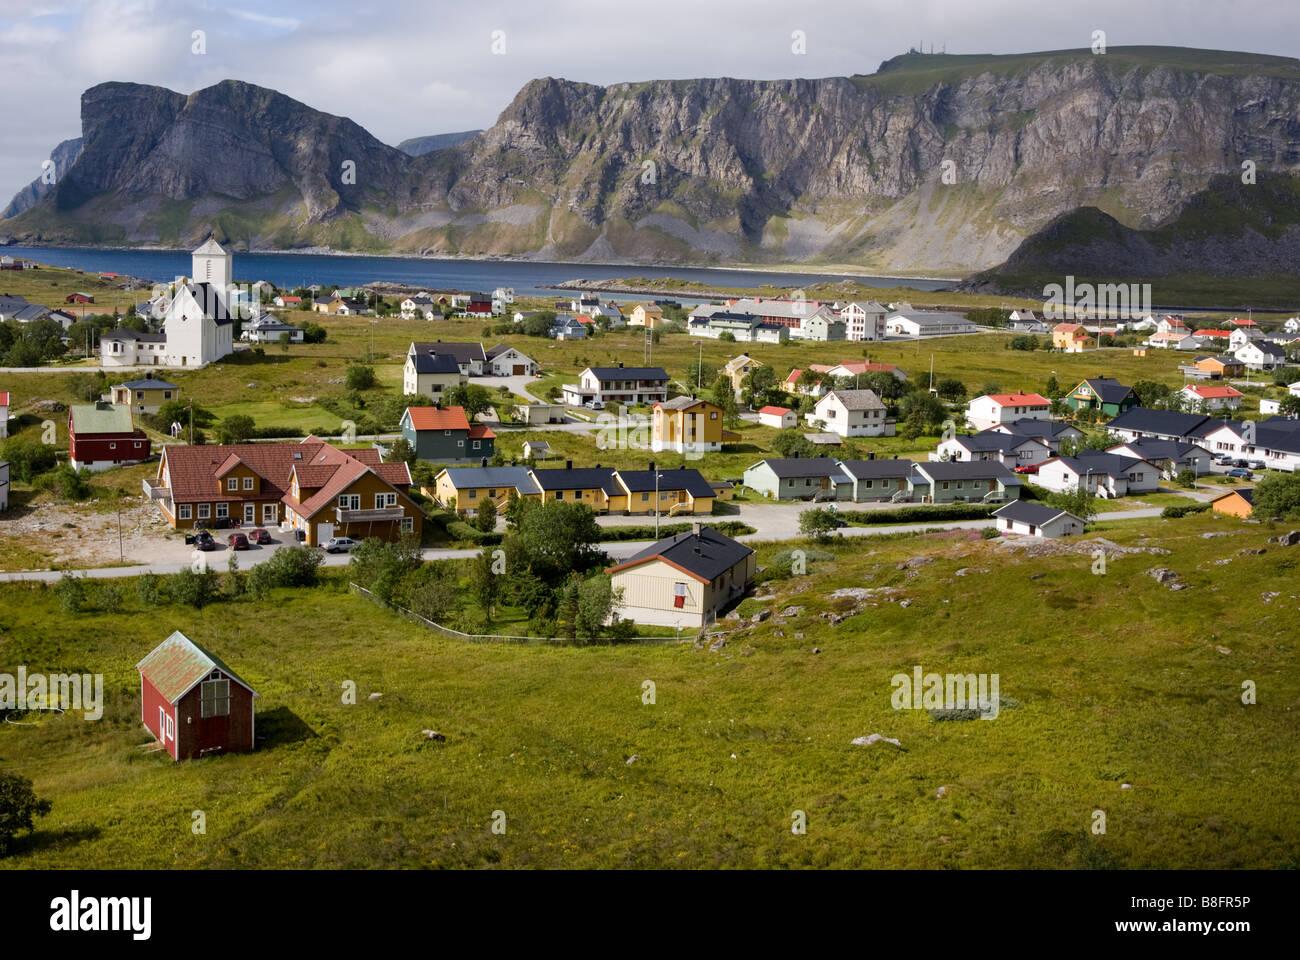 Sørland, Værøy, Lofoten, Nordland, Norway, Scandinavia - Stock Image